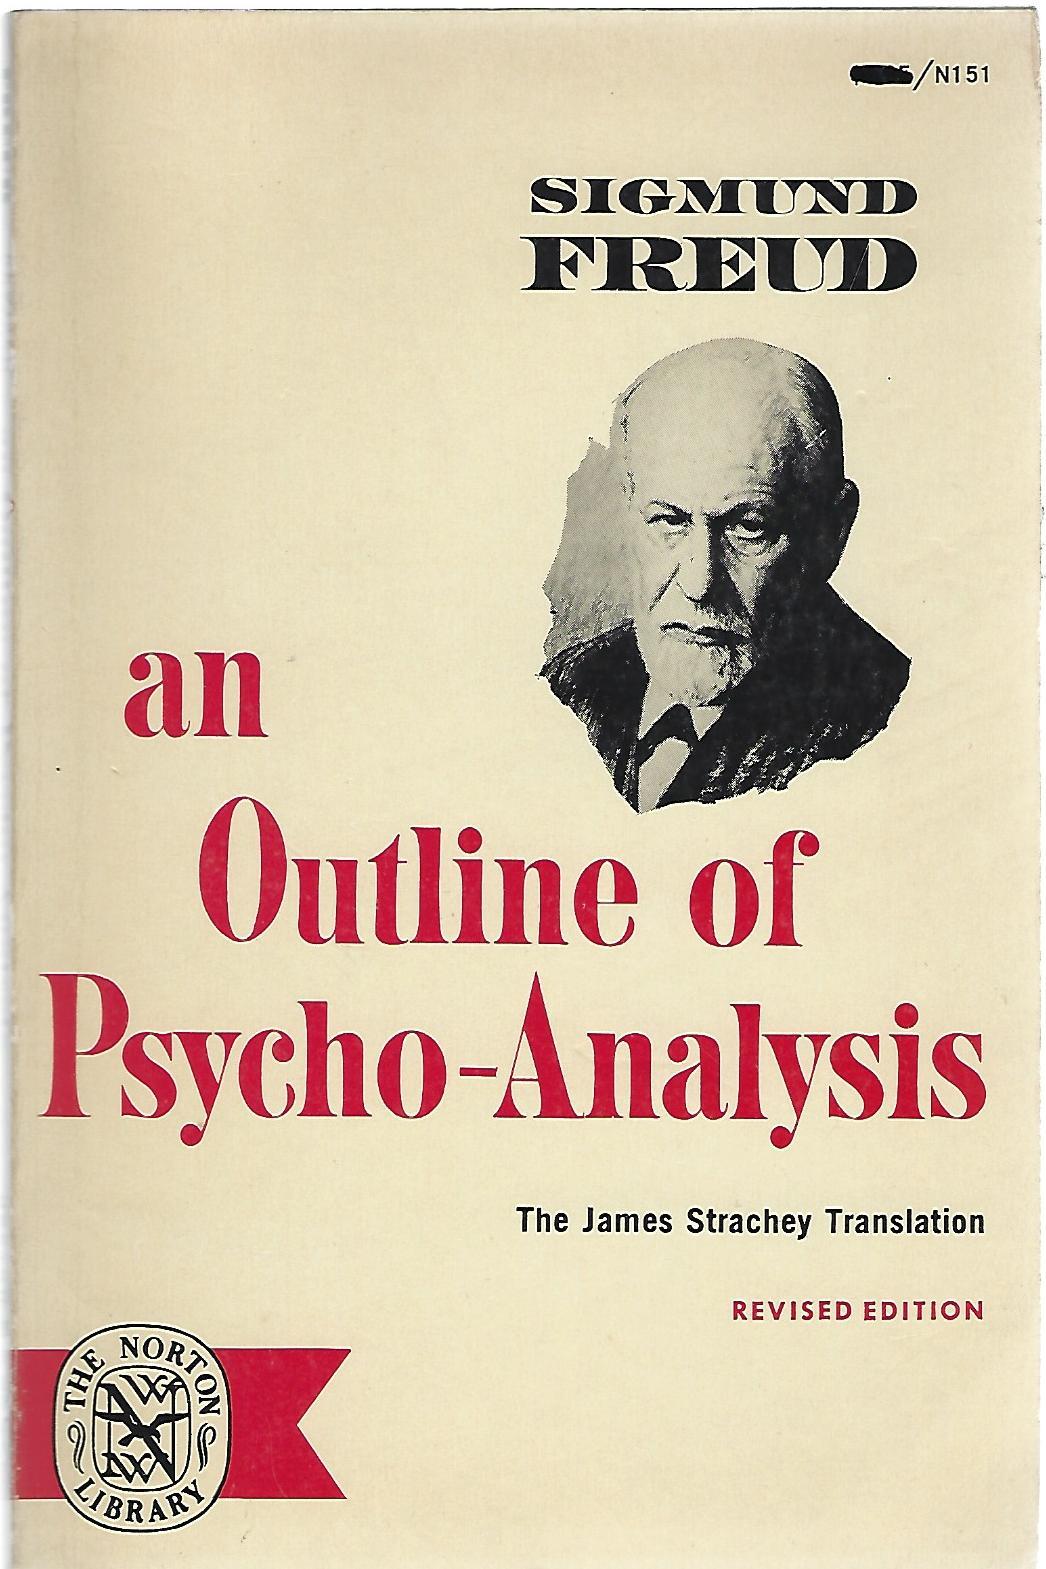 AN OUTLINE OF PSYCHO-ANALYSIS: Freud, Sigmund